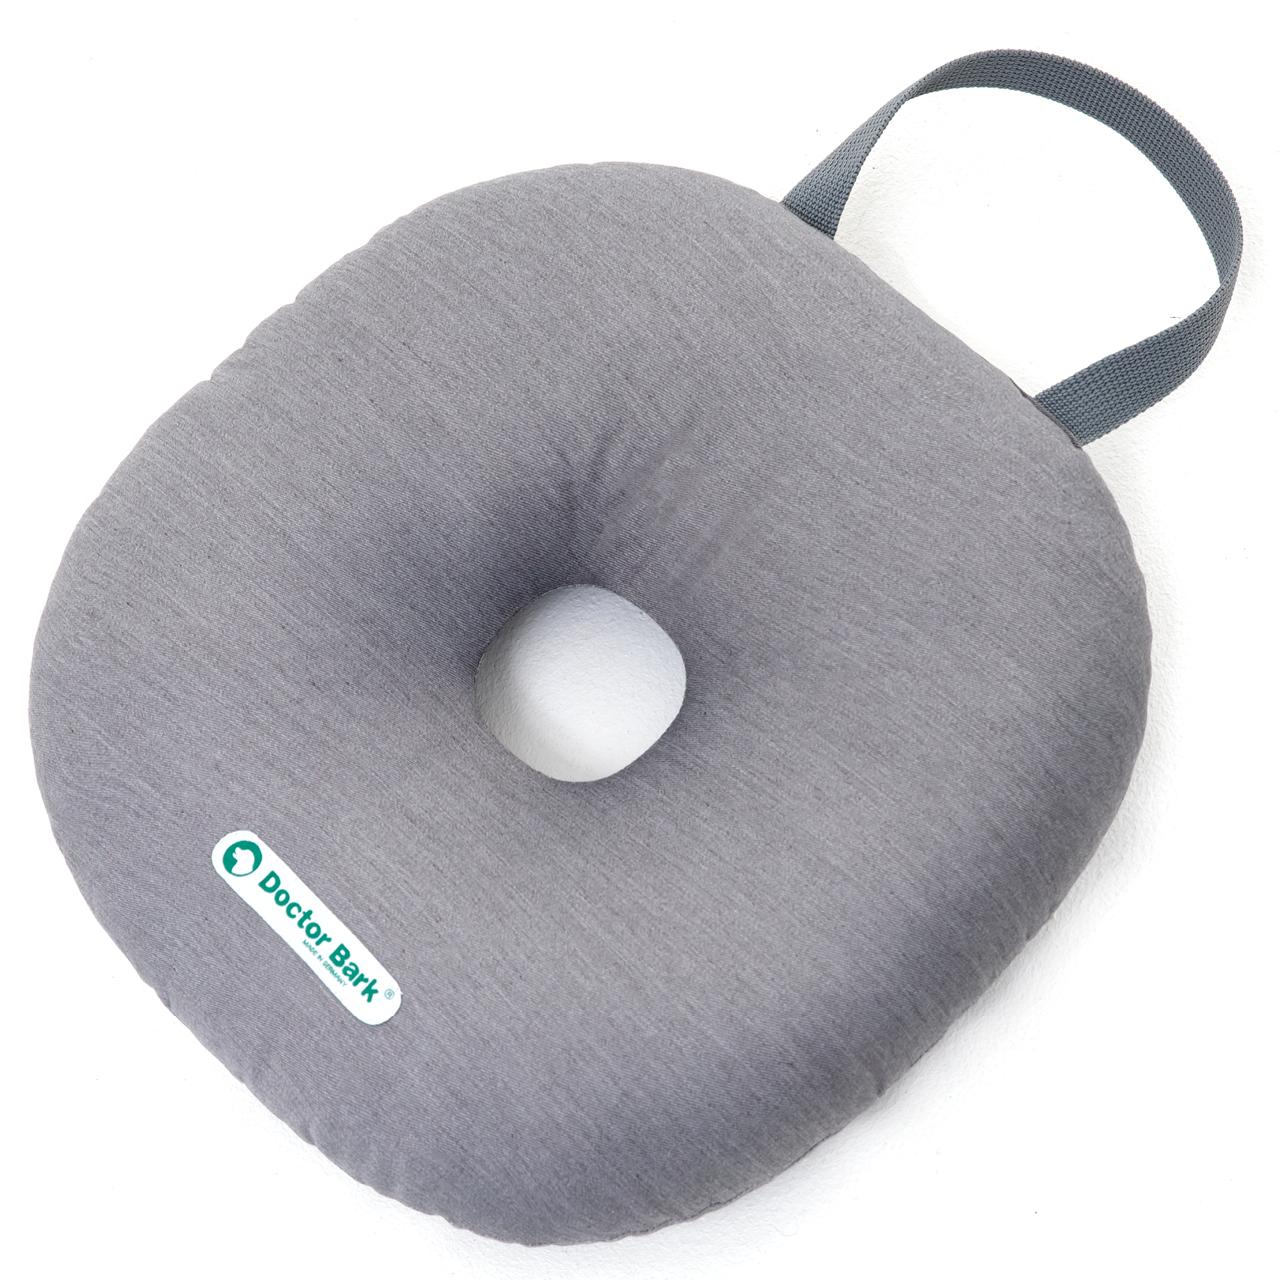 Toy Donut - round S hellgrau